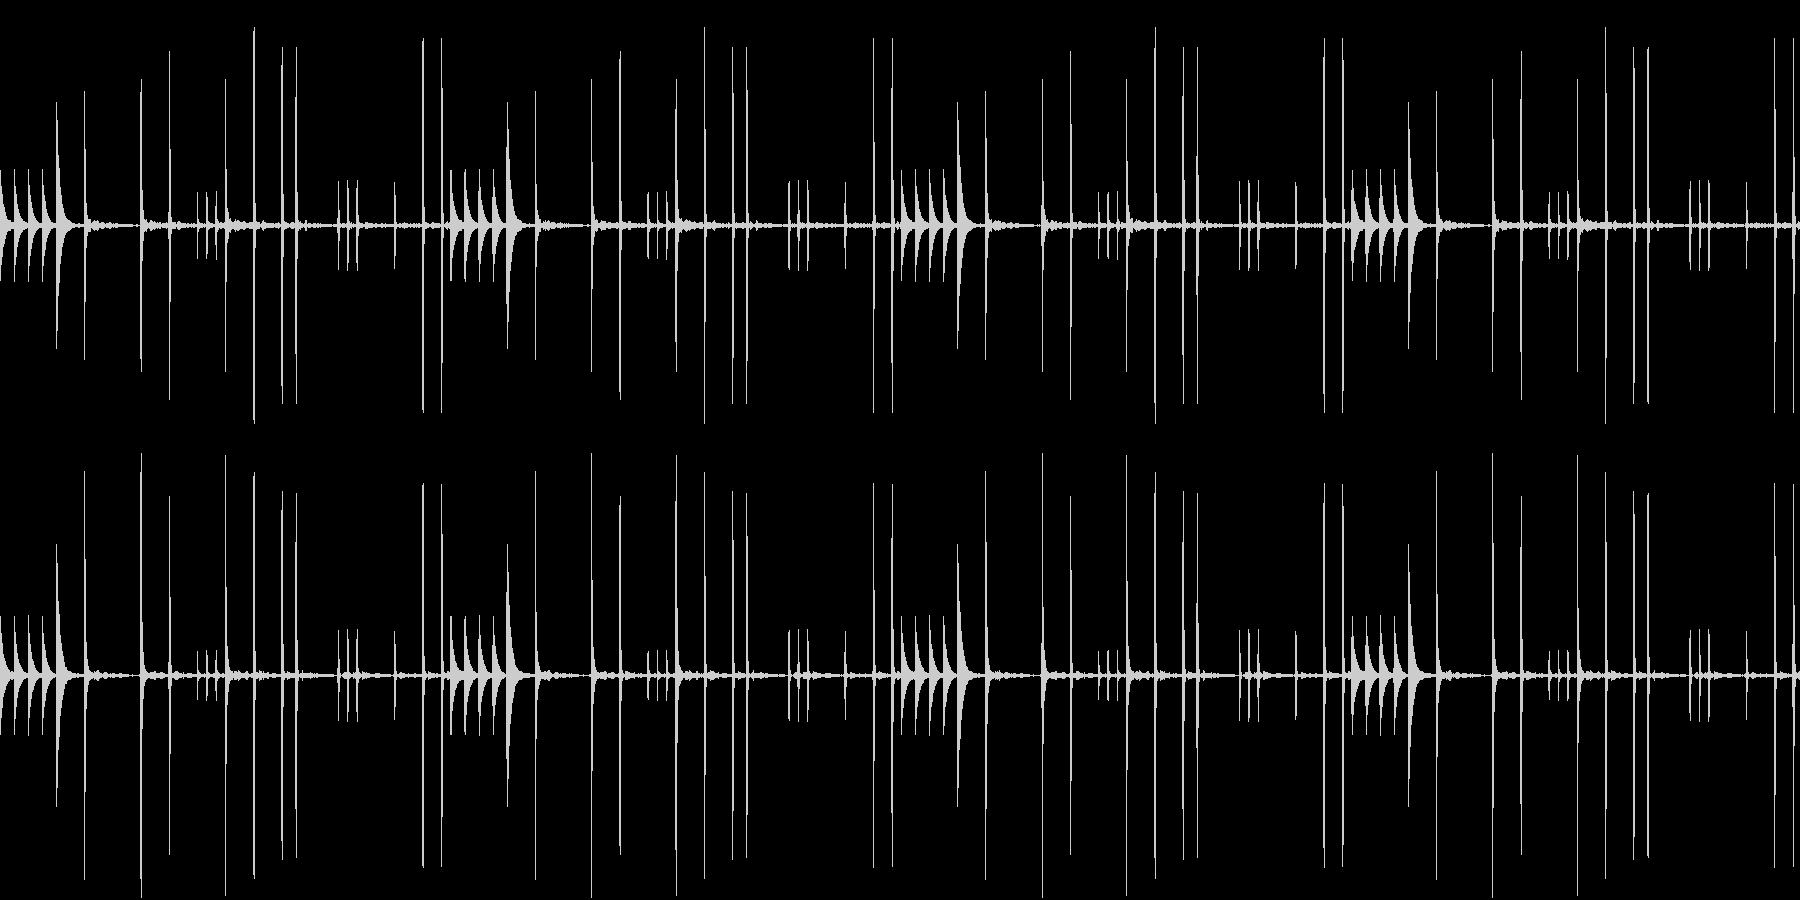 WoodBlocks 尾行のテーマの未再生の波形